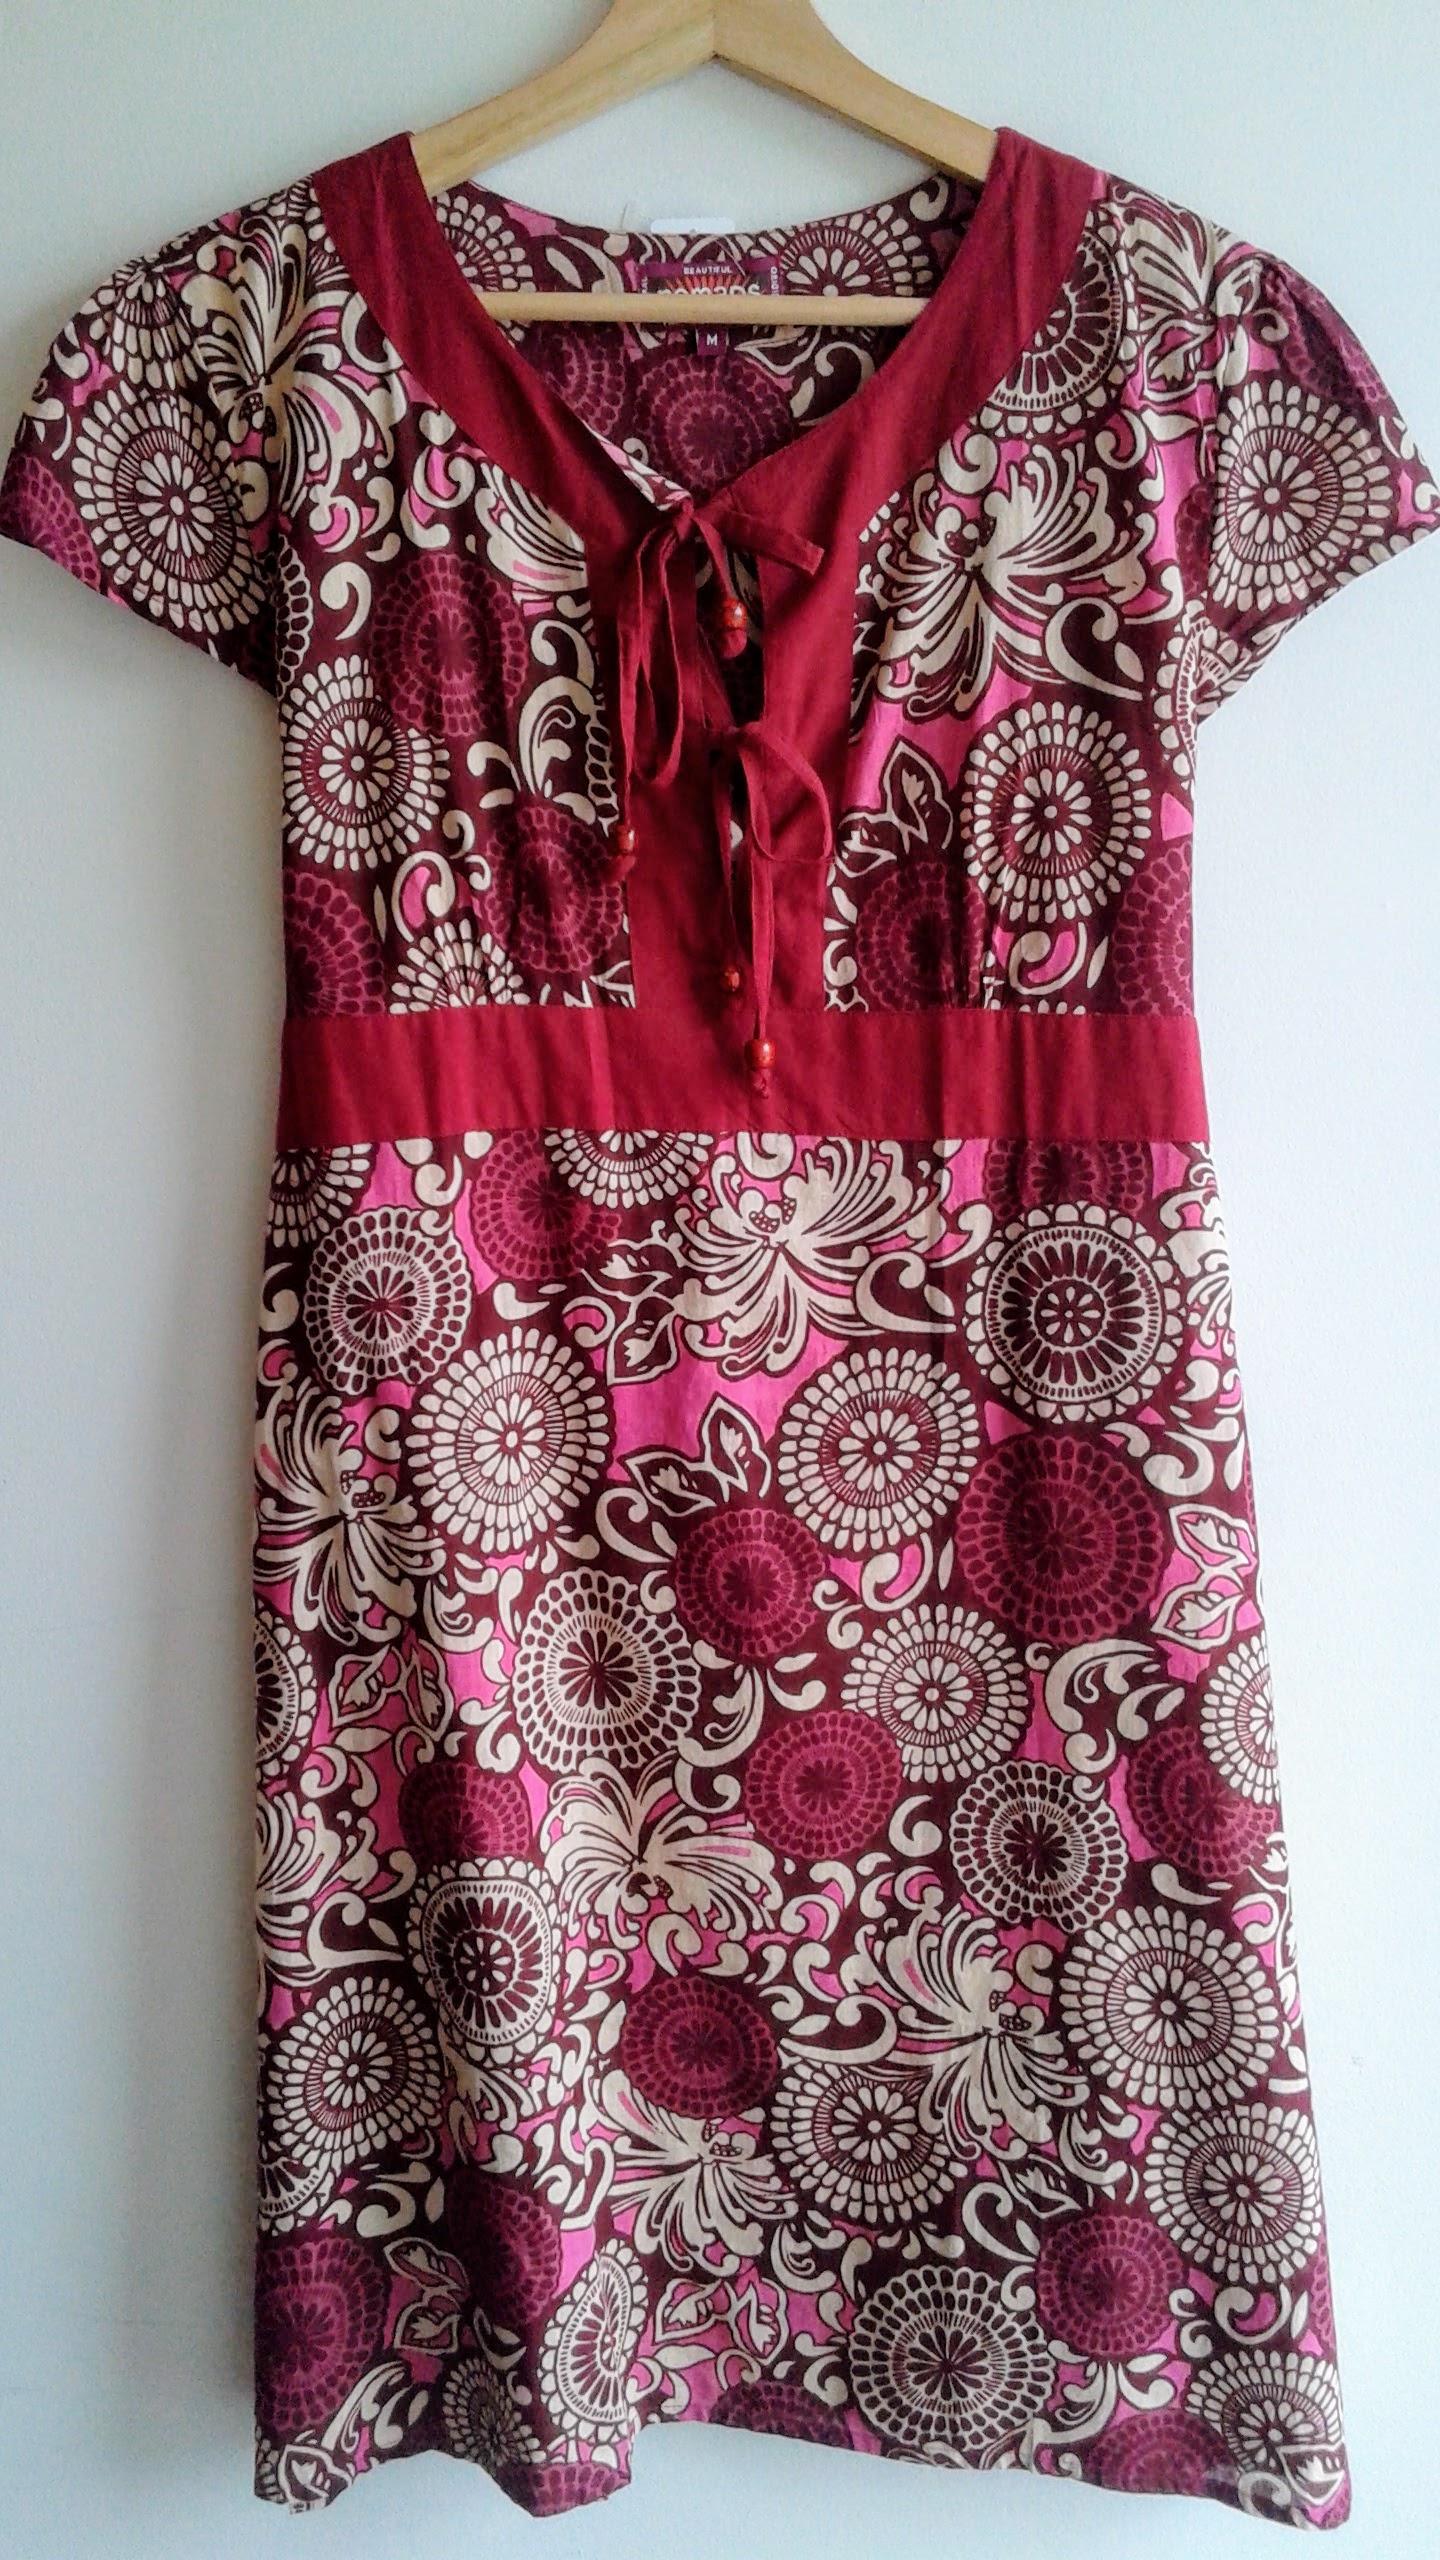 Nomad dress; Size M, $26